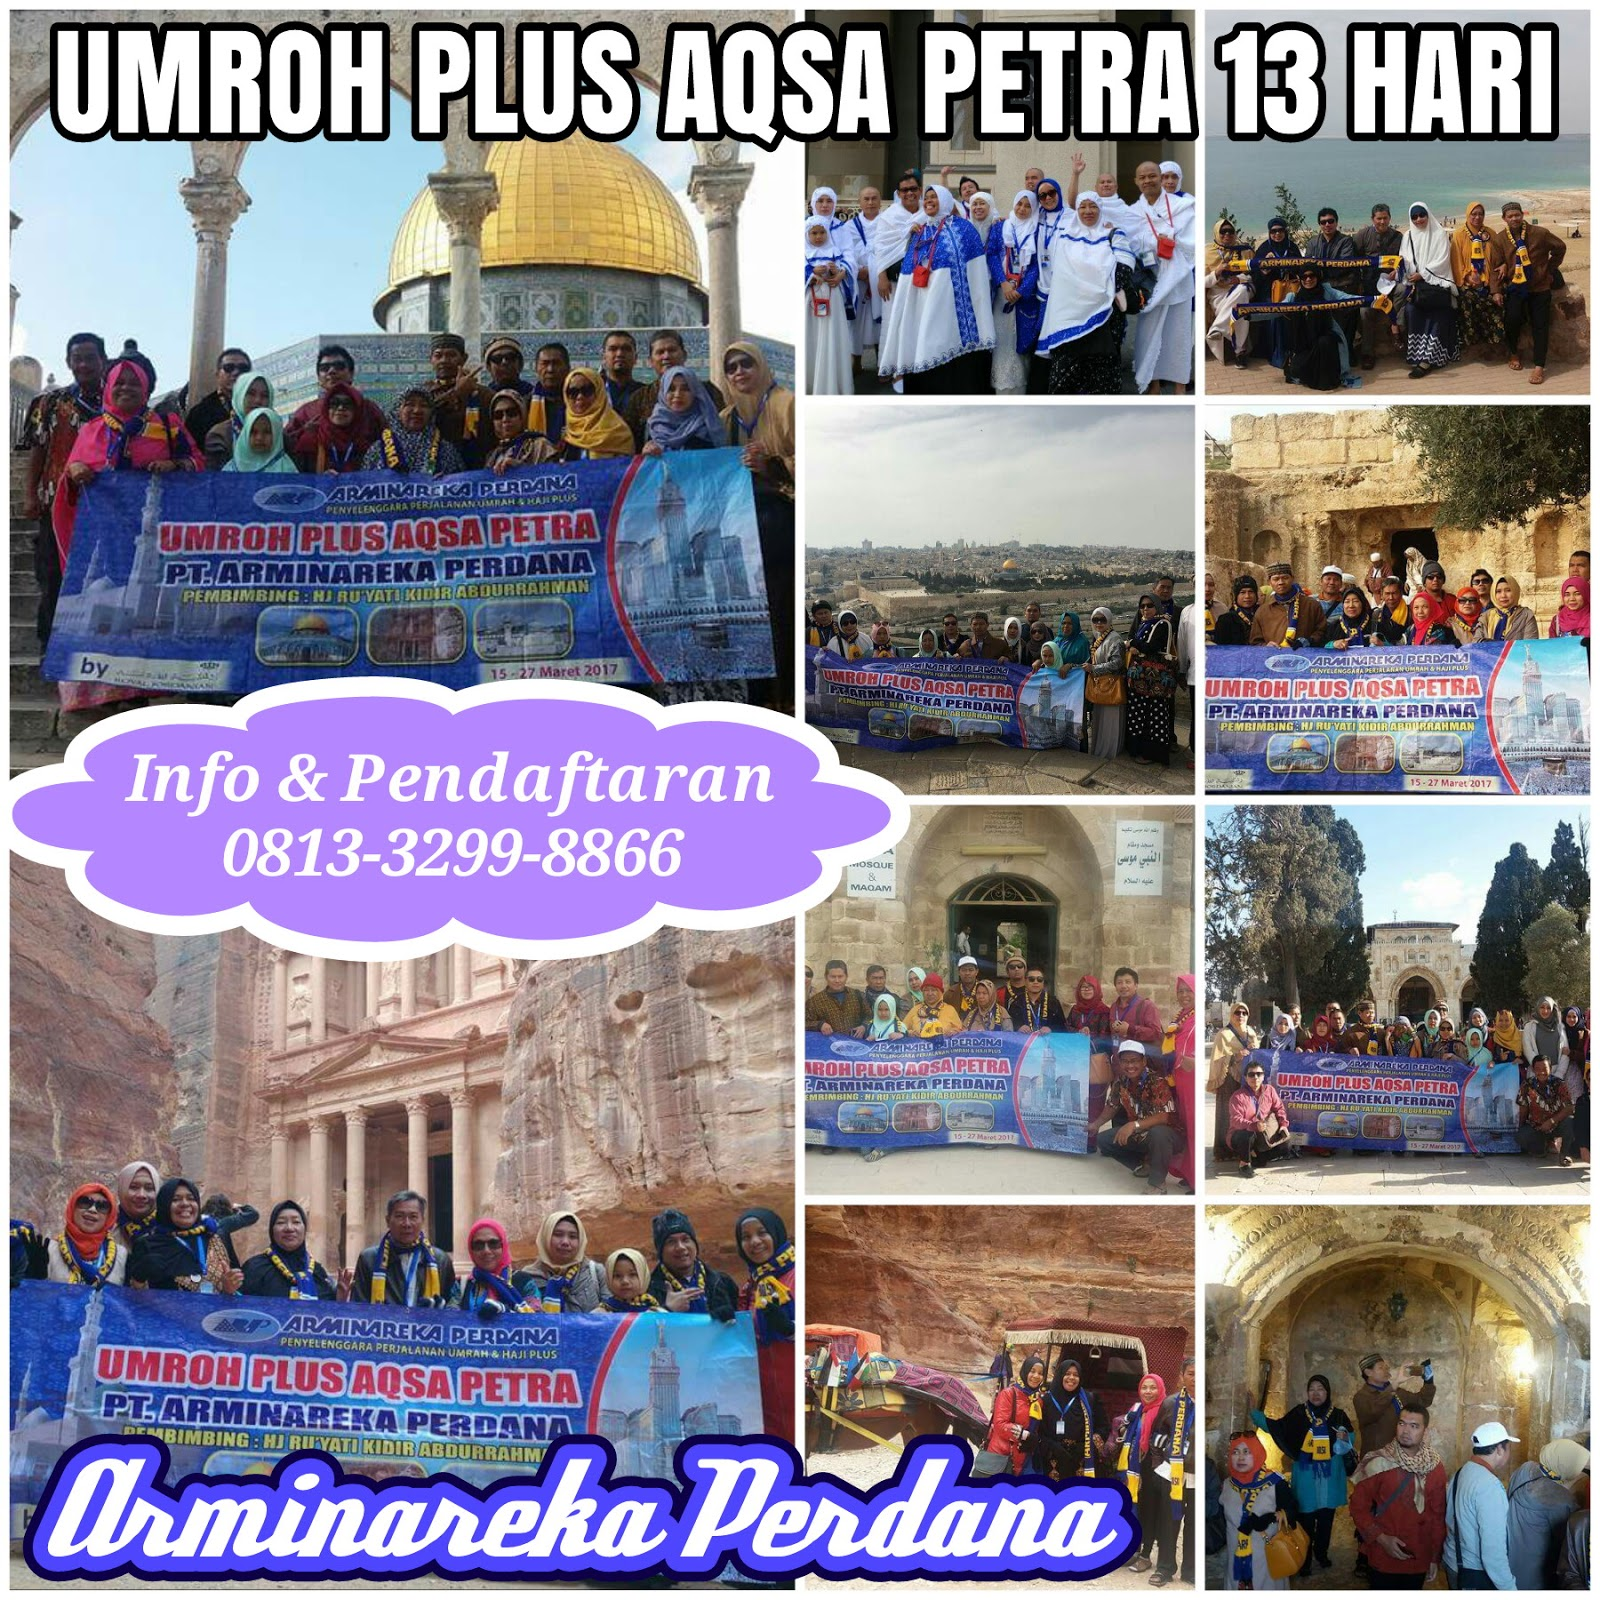 Umroh Start Jakarta  Arminareka Perdana Surabaya